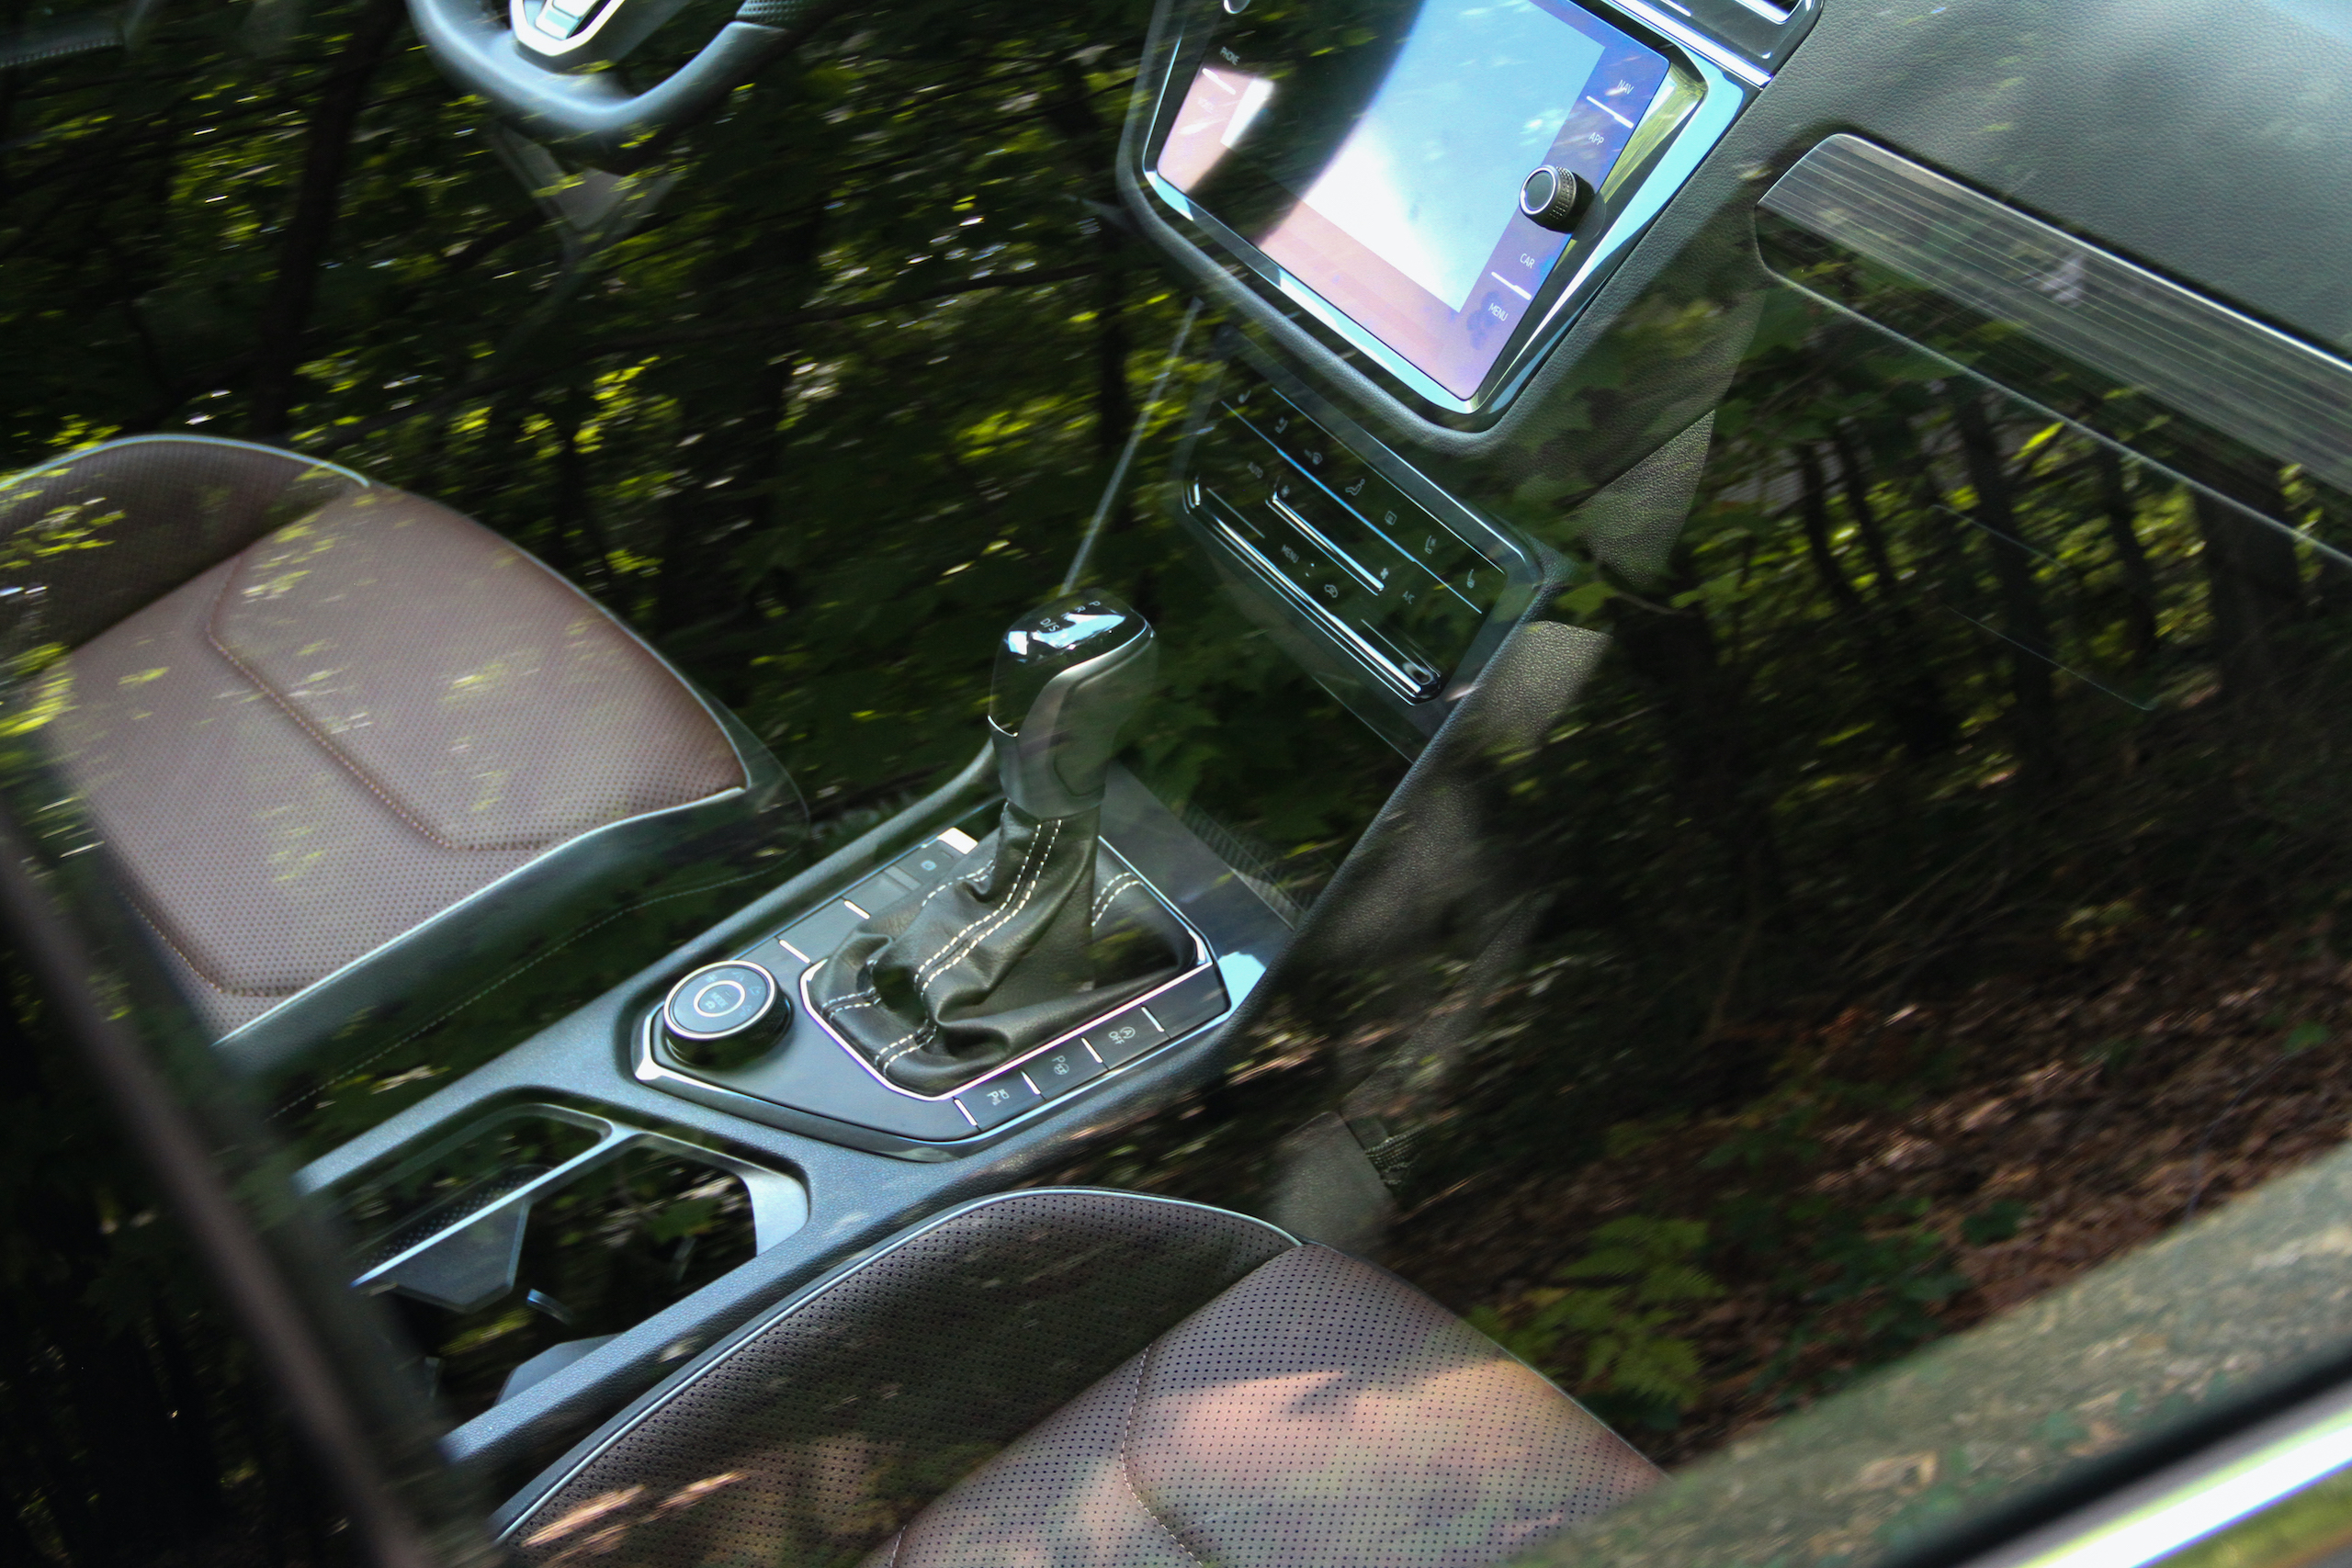 2022 VW Tiguan SEL R-Line interior through window